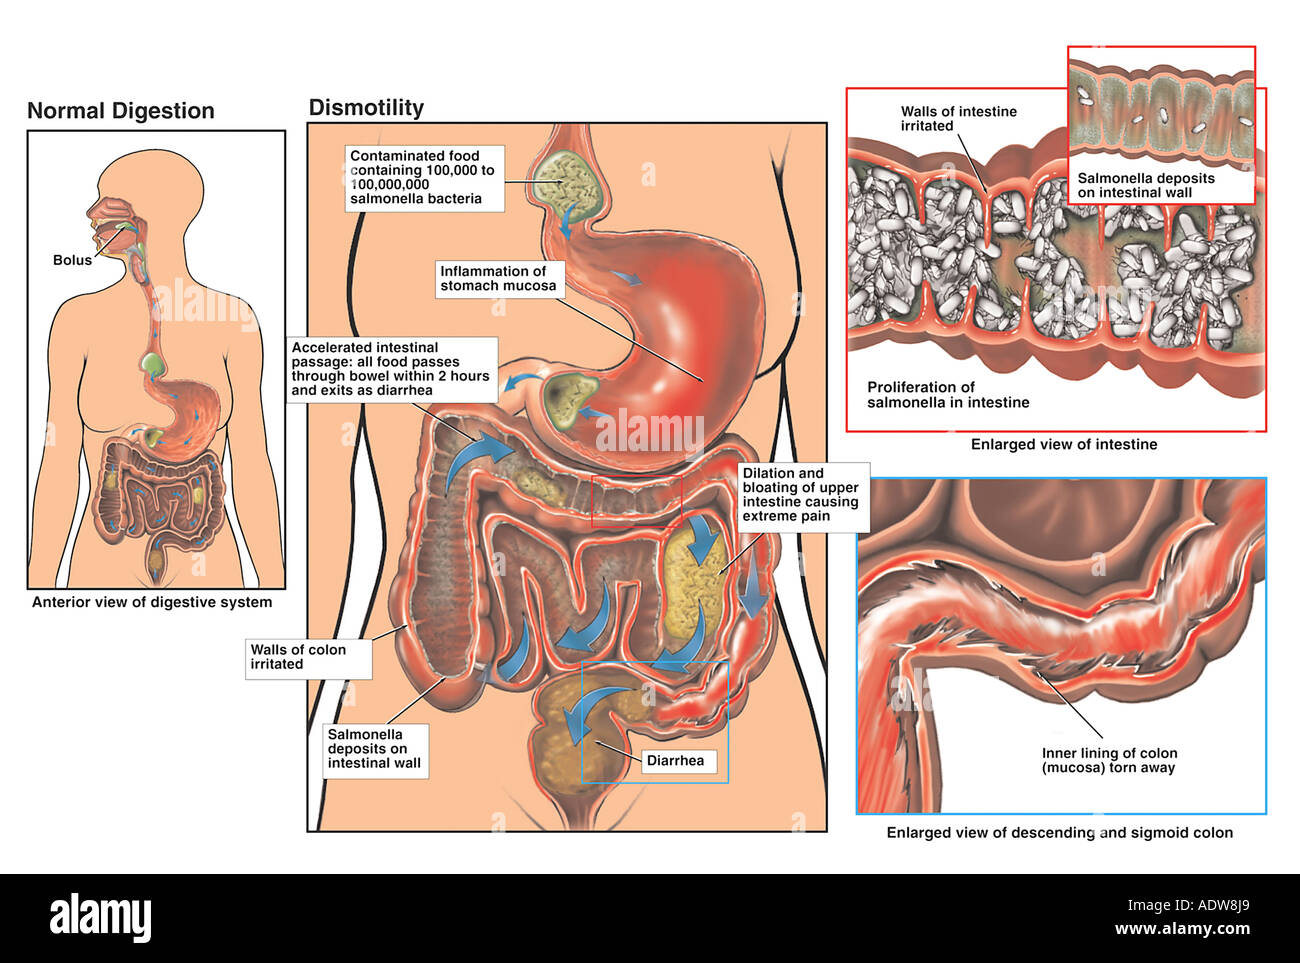 Proliferation of Salmonella with Severe Gastroenteritis - Stock Image